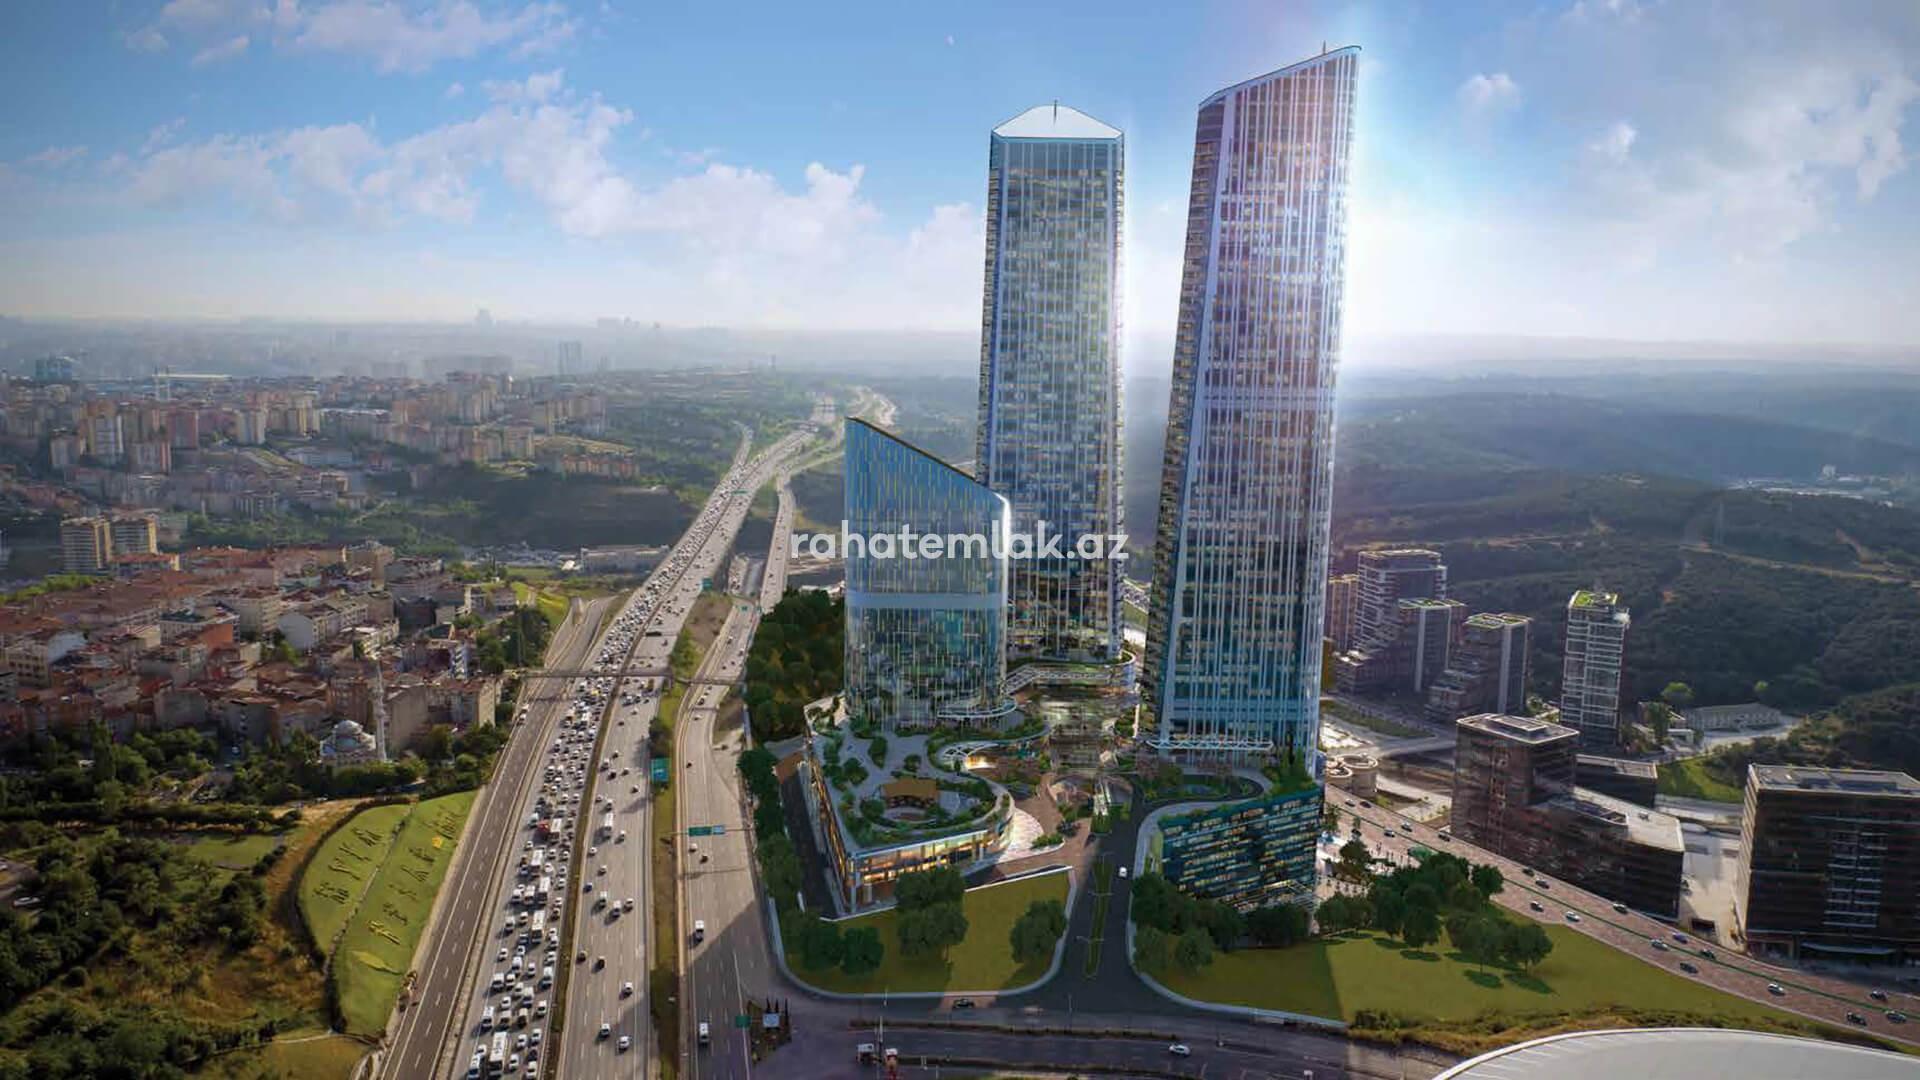 Istanbul's tallest skyscraper residence